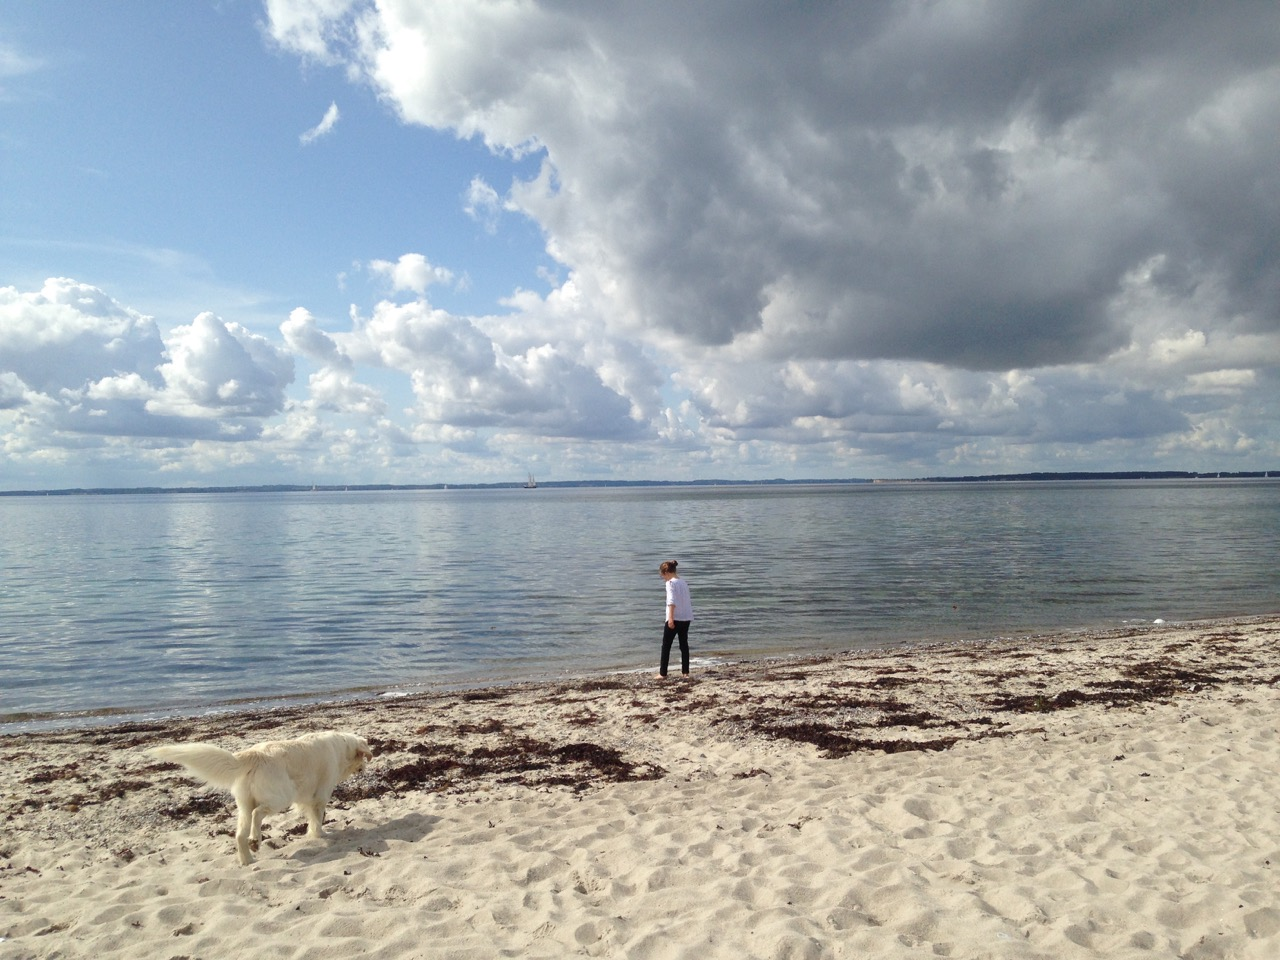 VisualVest/ Dänemark: Insel Kegnaes und die Ostsee